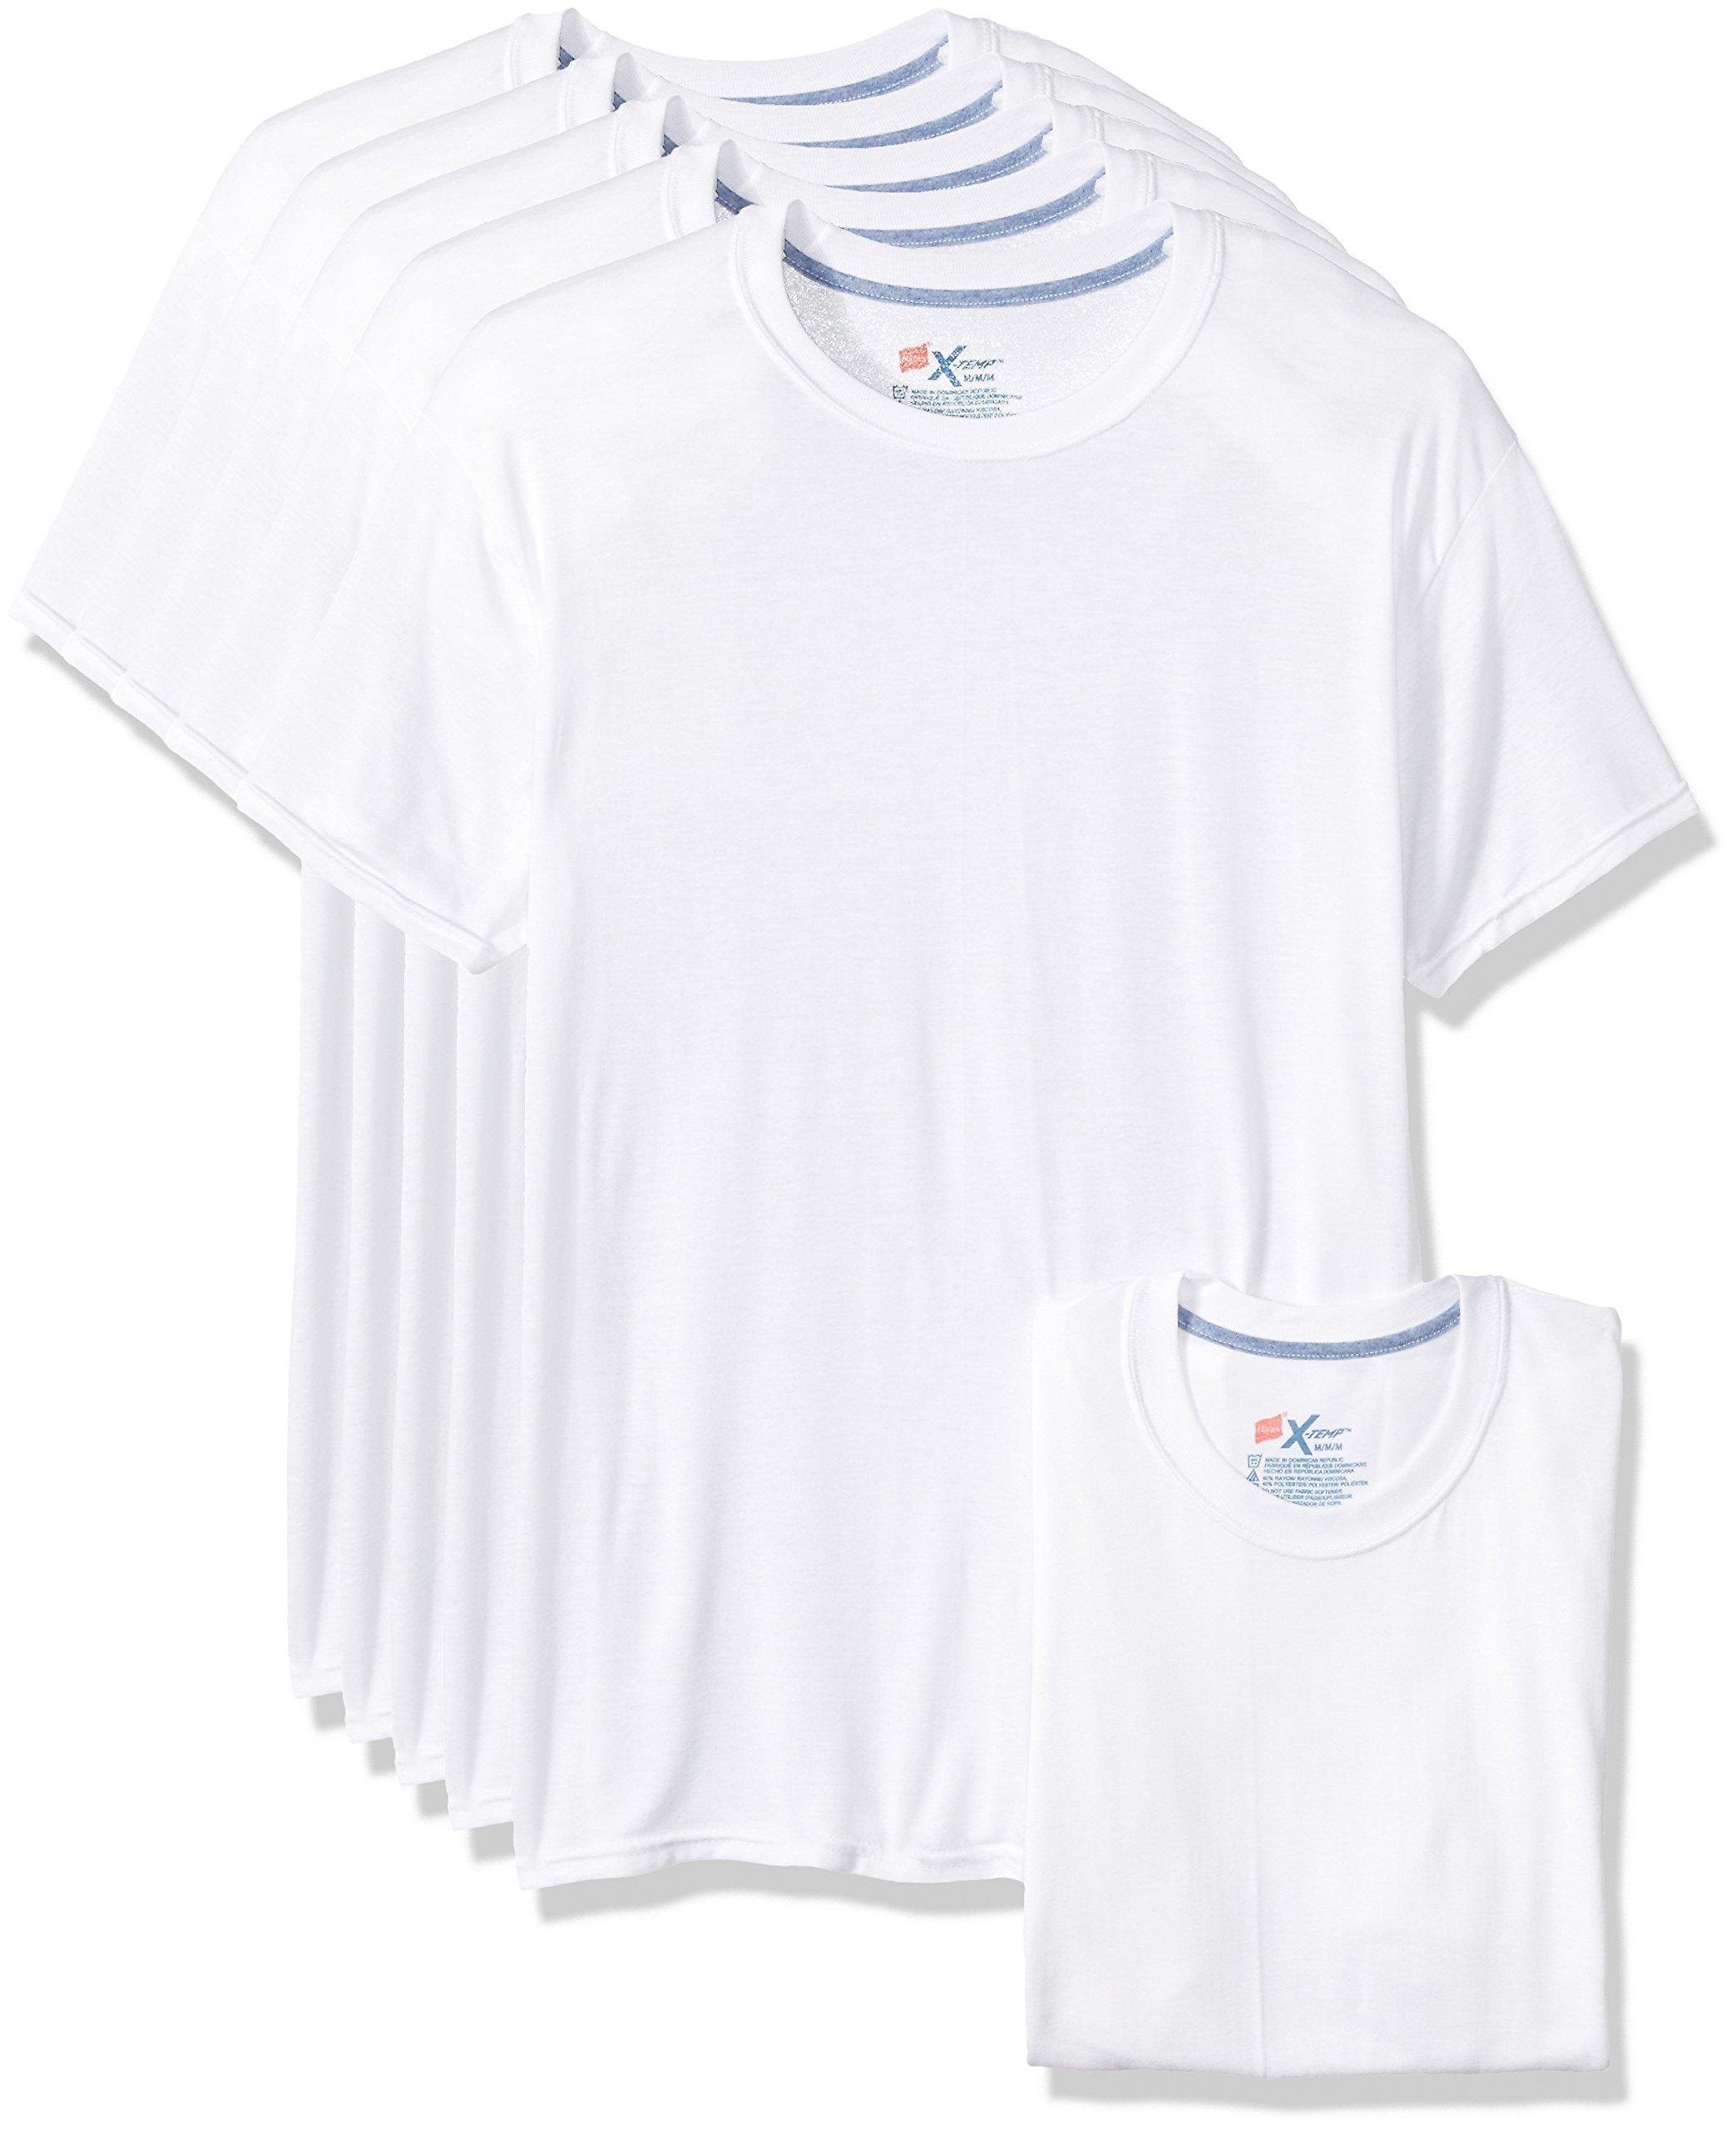 Hanes Men's 5-Pack X-Temp Comfort Cool Crewneck Undershirt